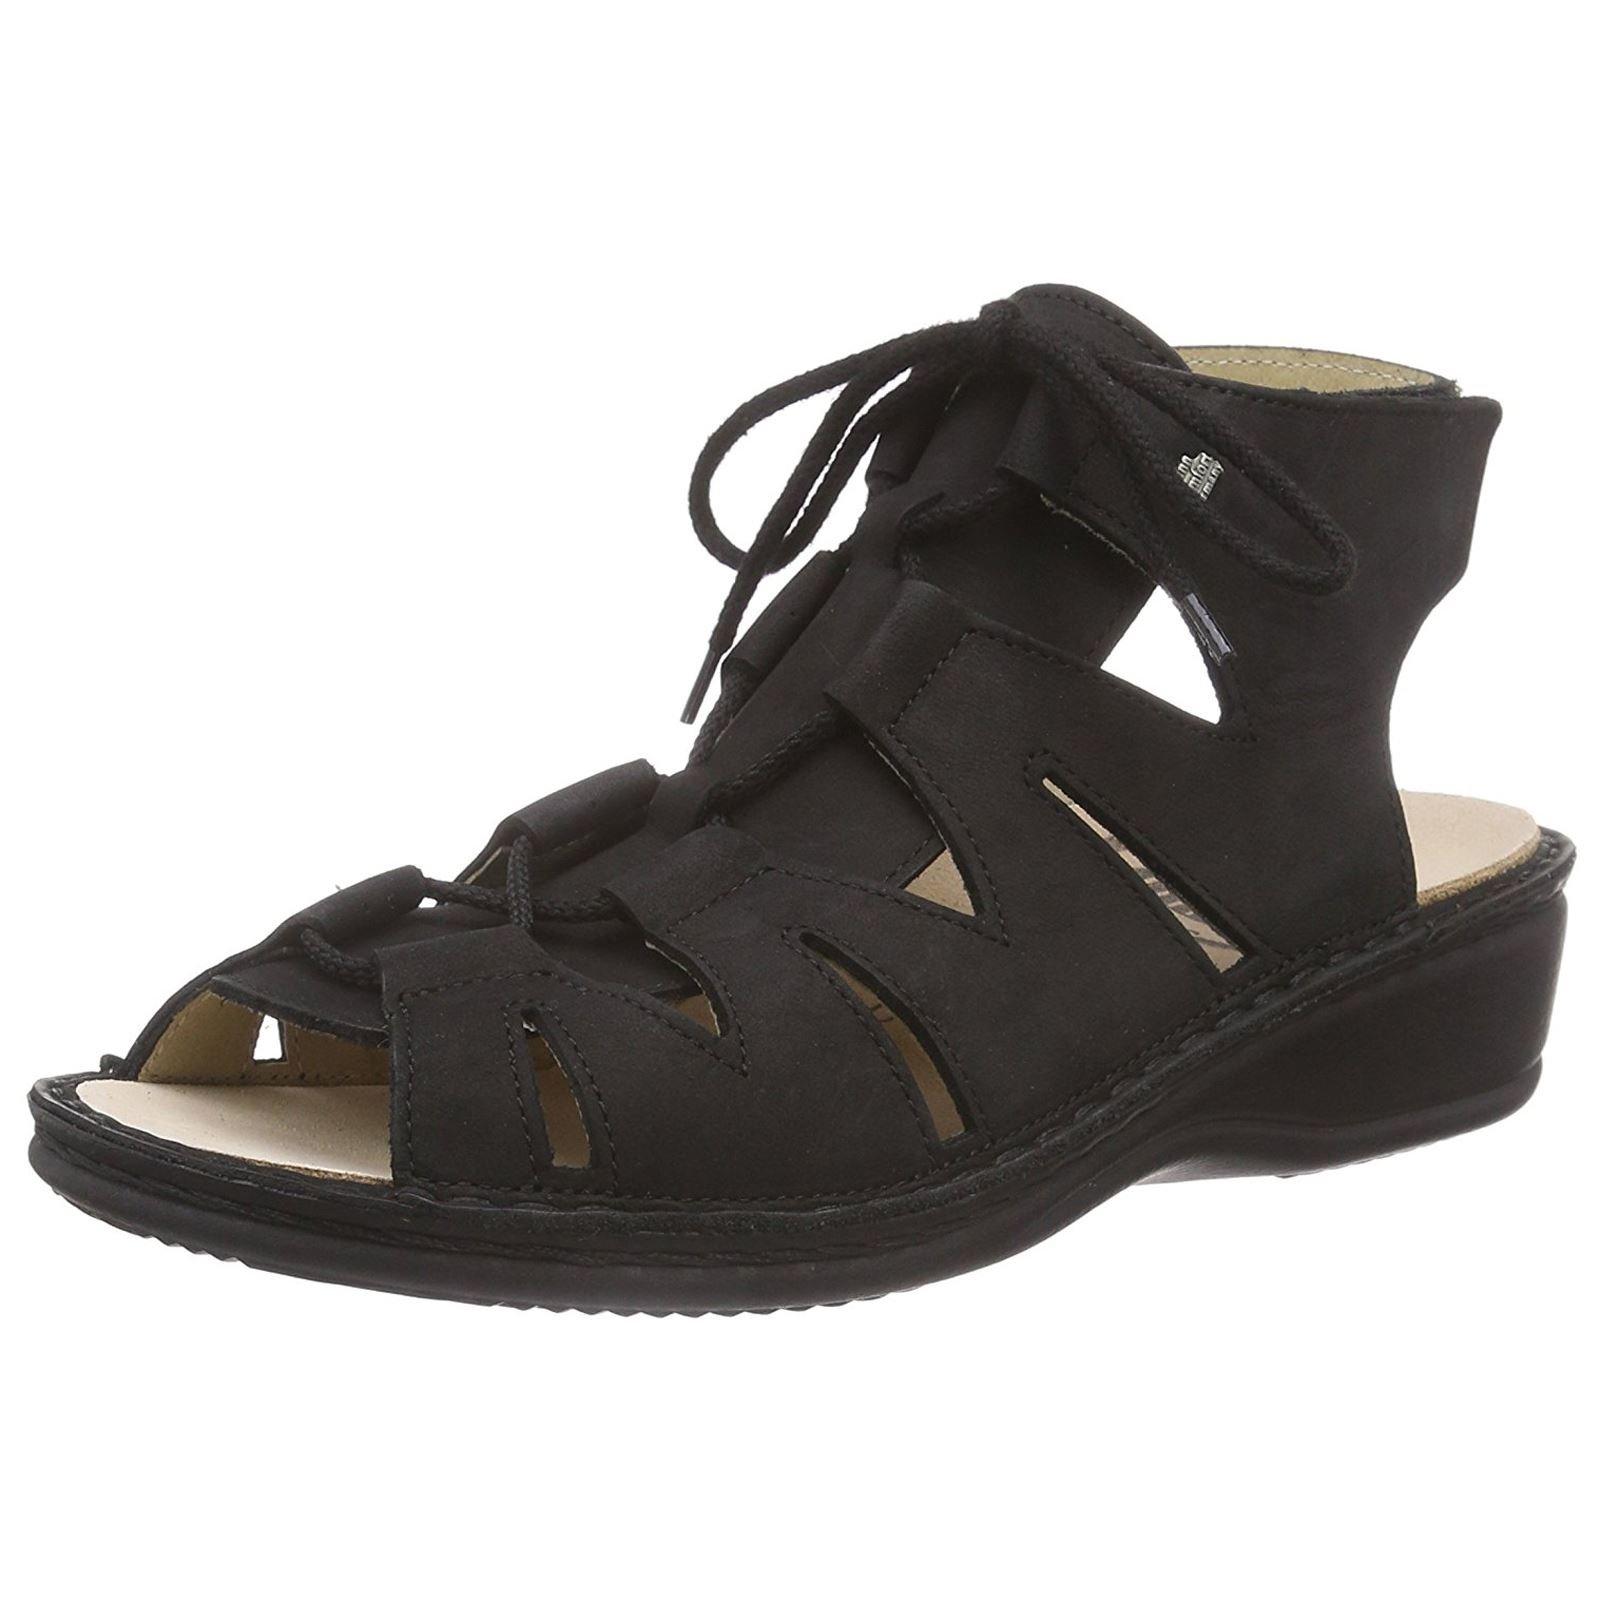 Finn Comfort Womens Malaga Black Leather Sandals 40 EU